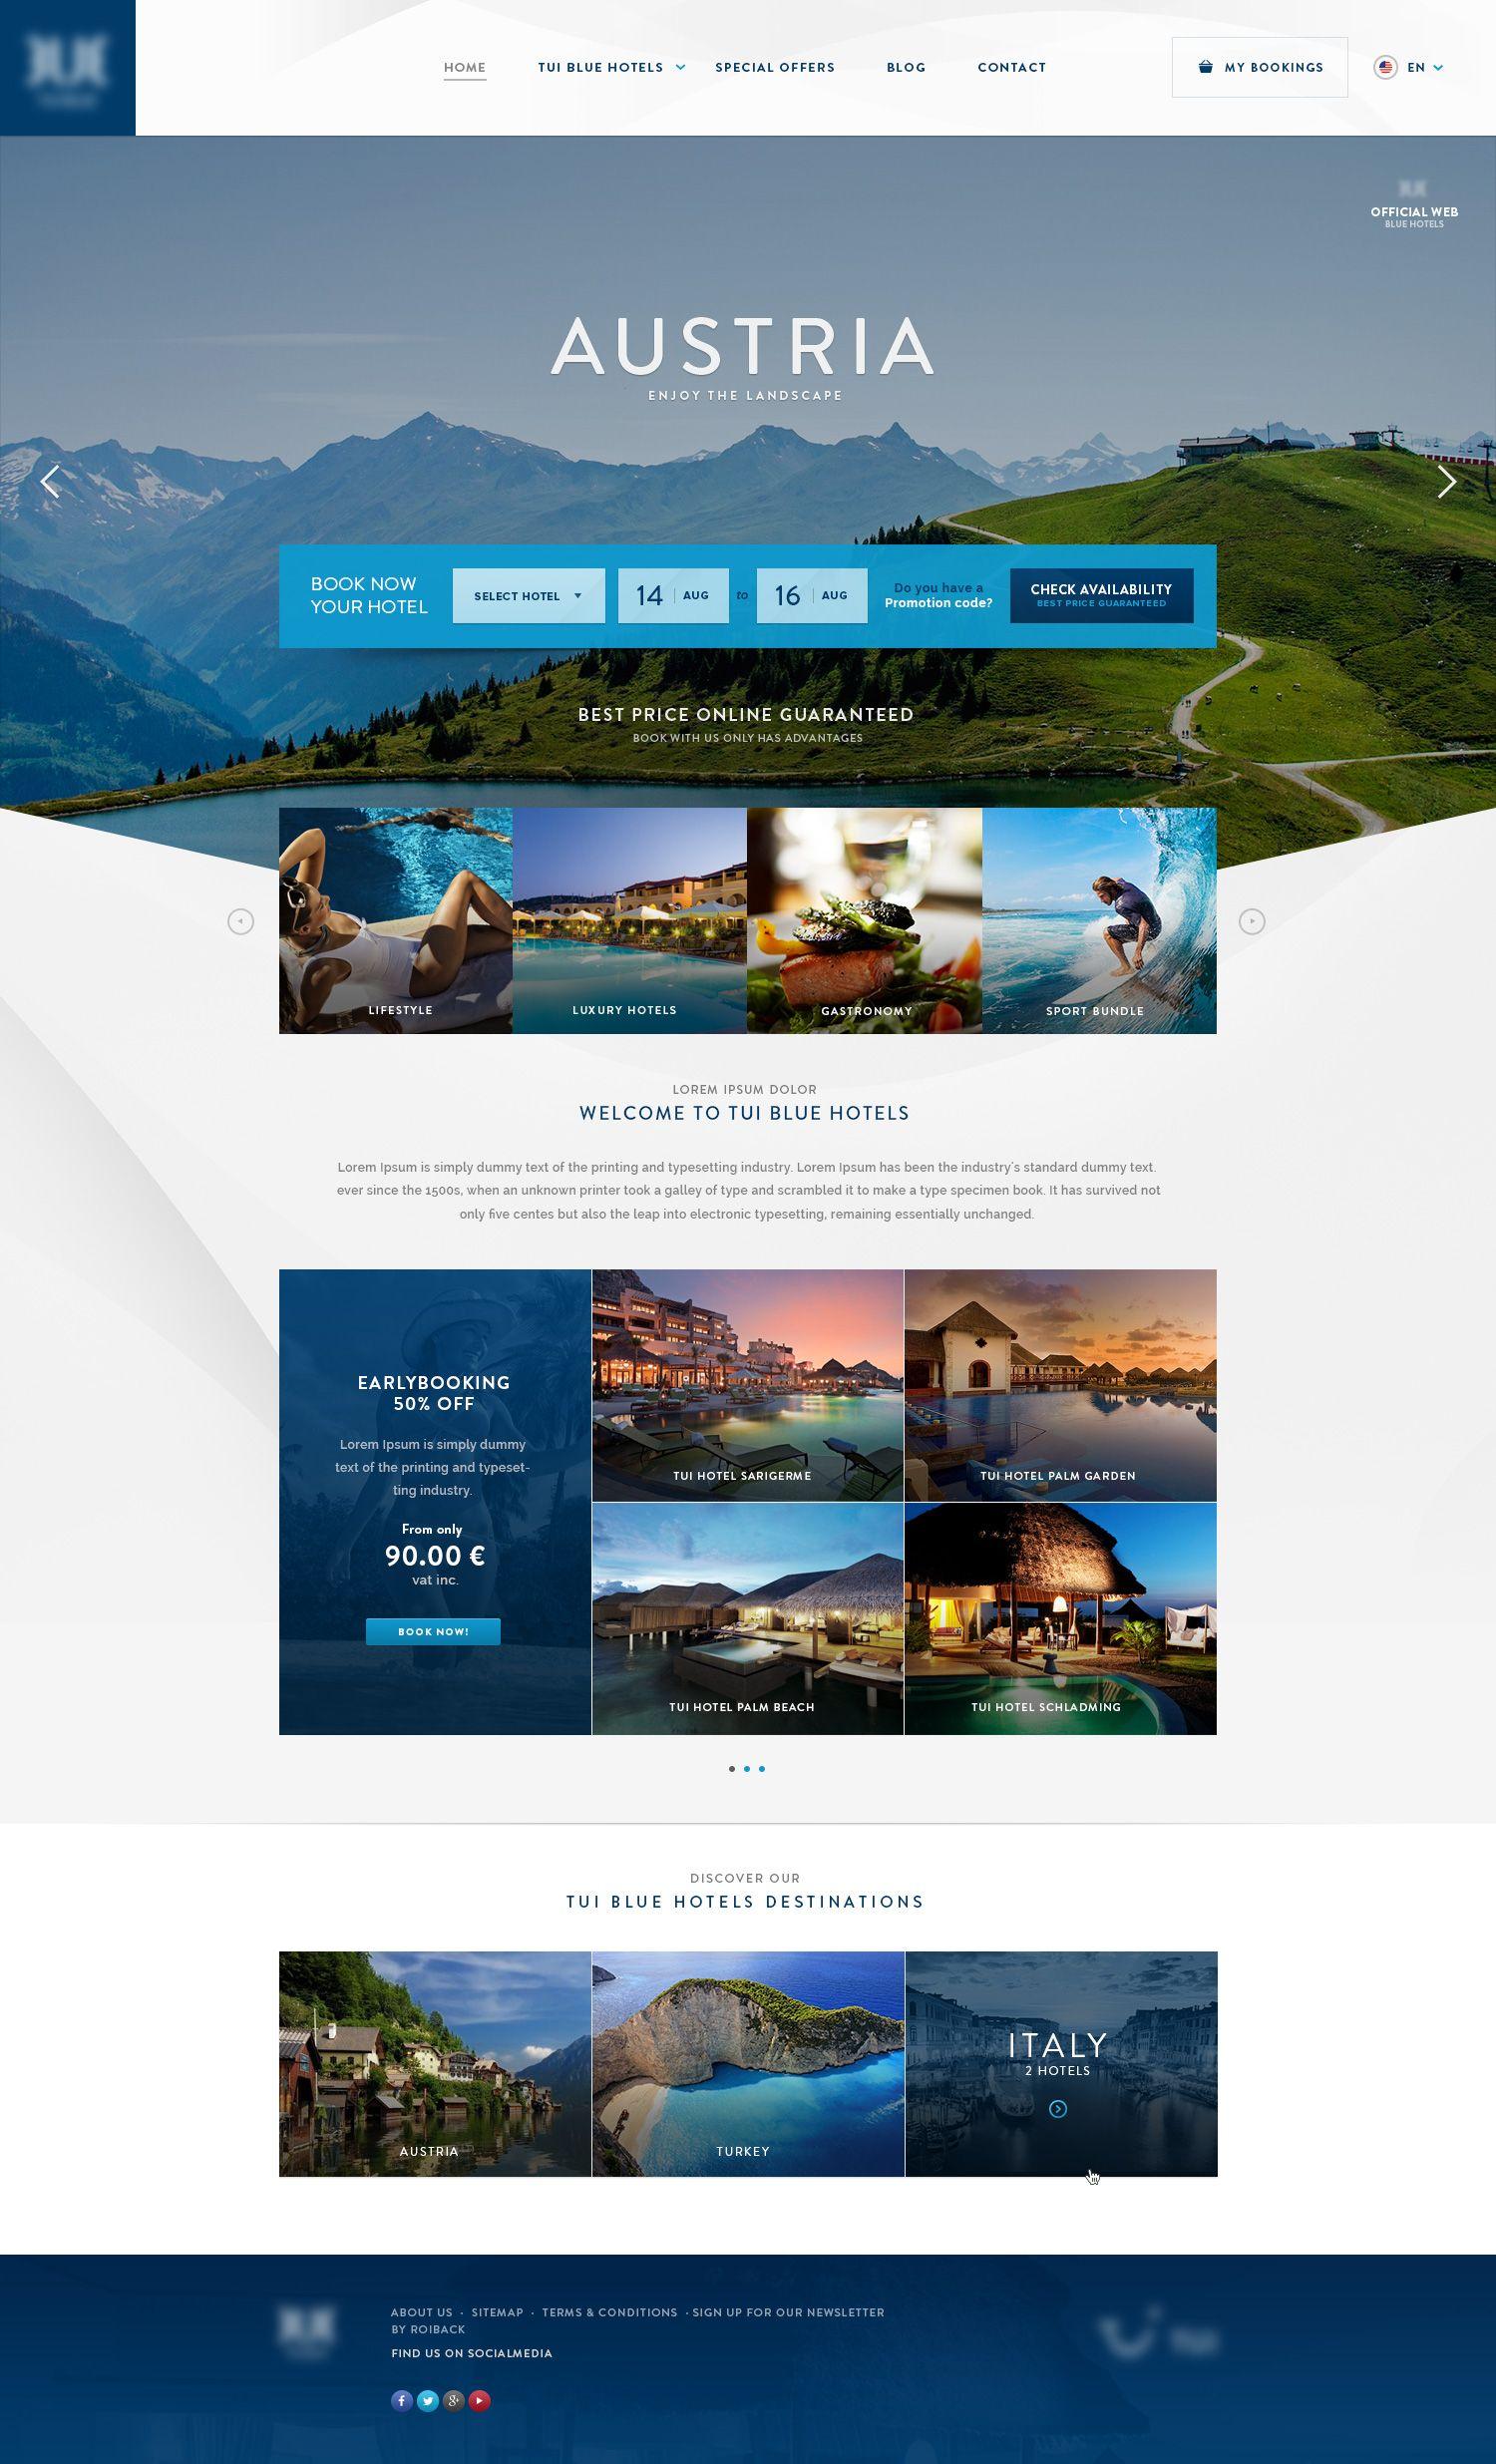 Home tuiblue corp #Austria #webdesign